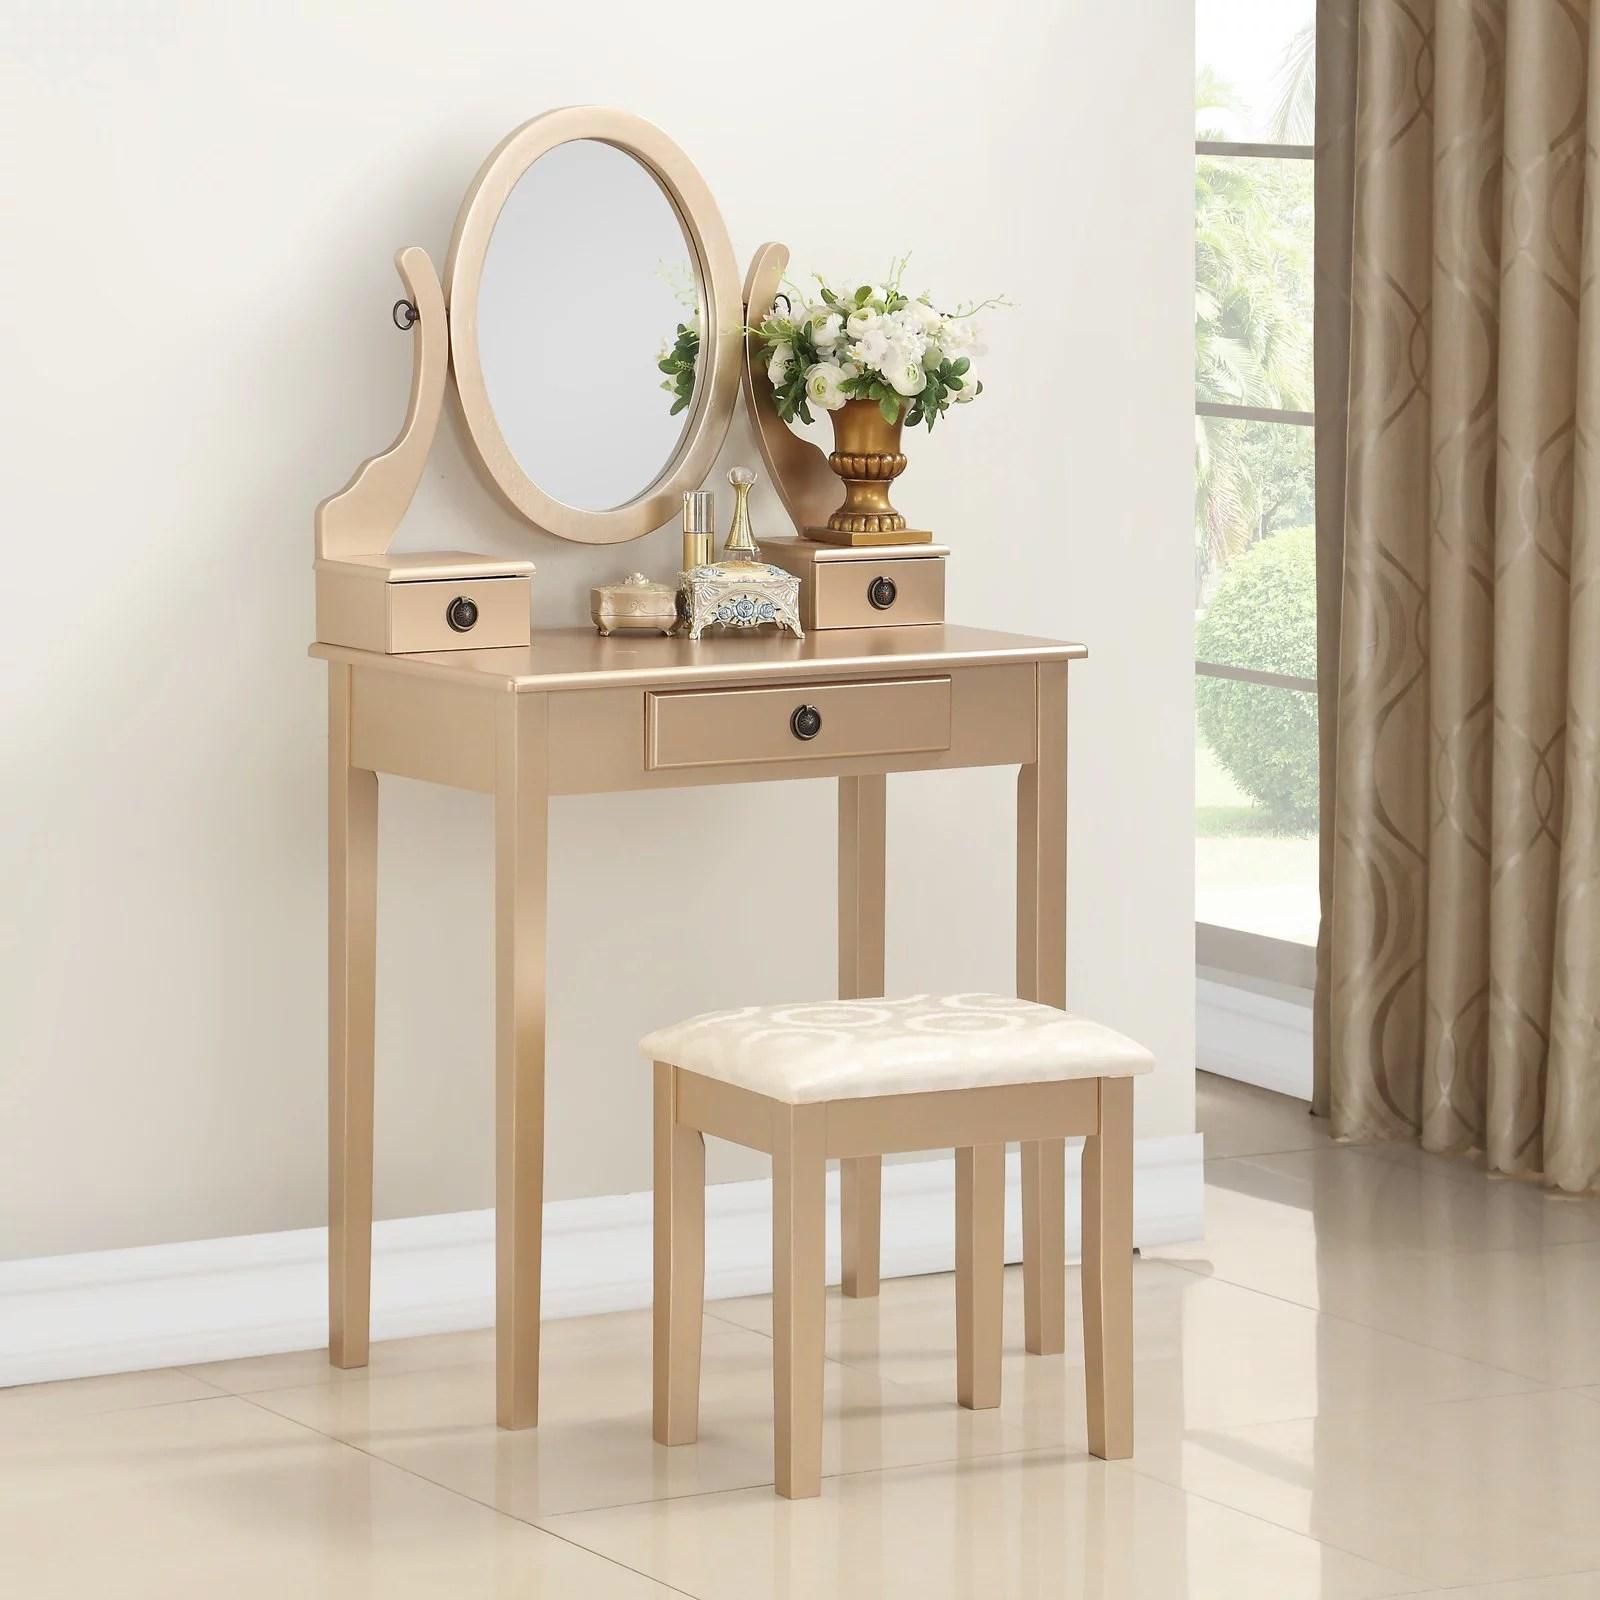 roundhill moniya wood makeup vanity table and stool set gold